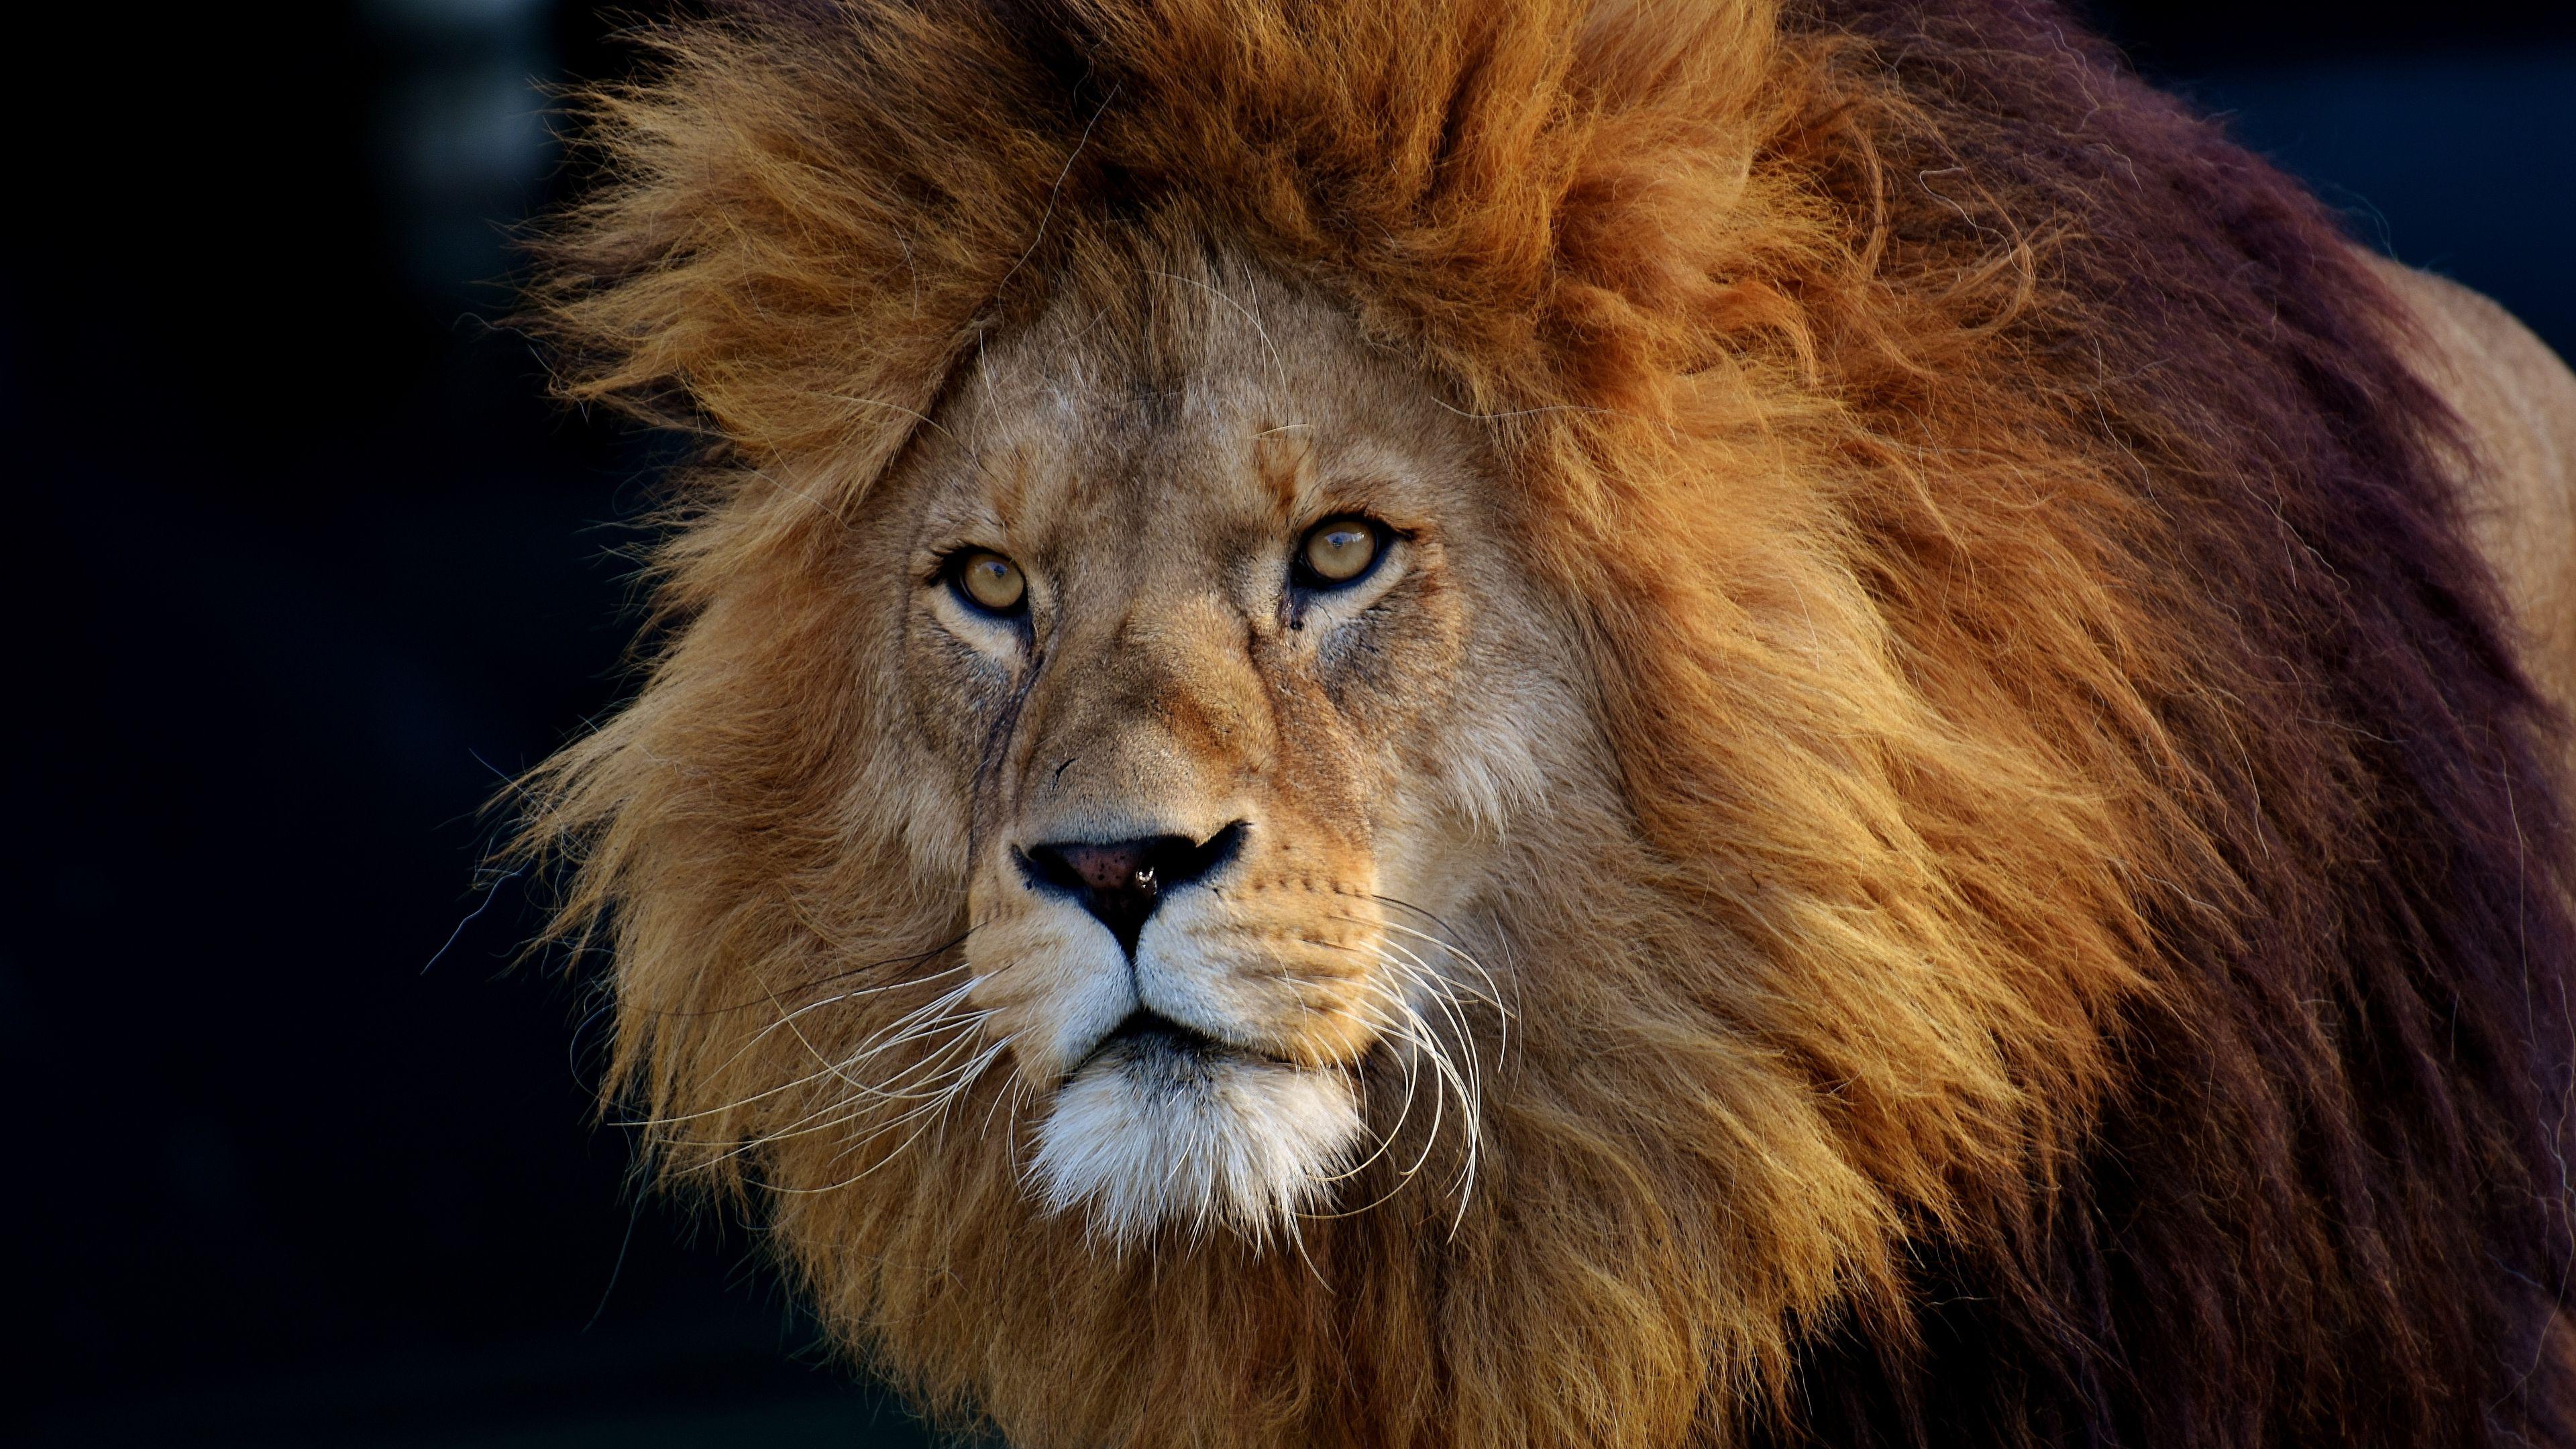 Download Cool Lion Photos Hd With Images Lions Photos Lion